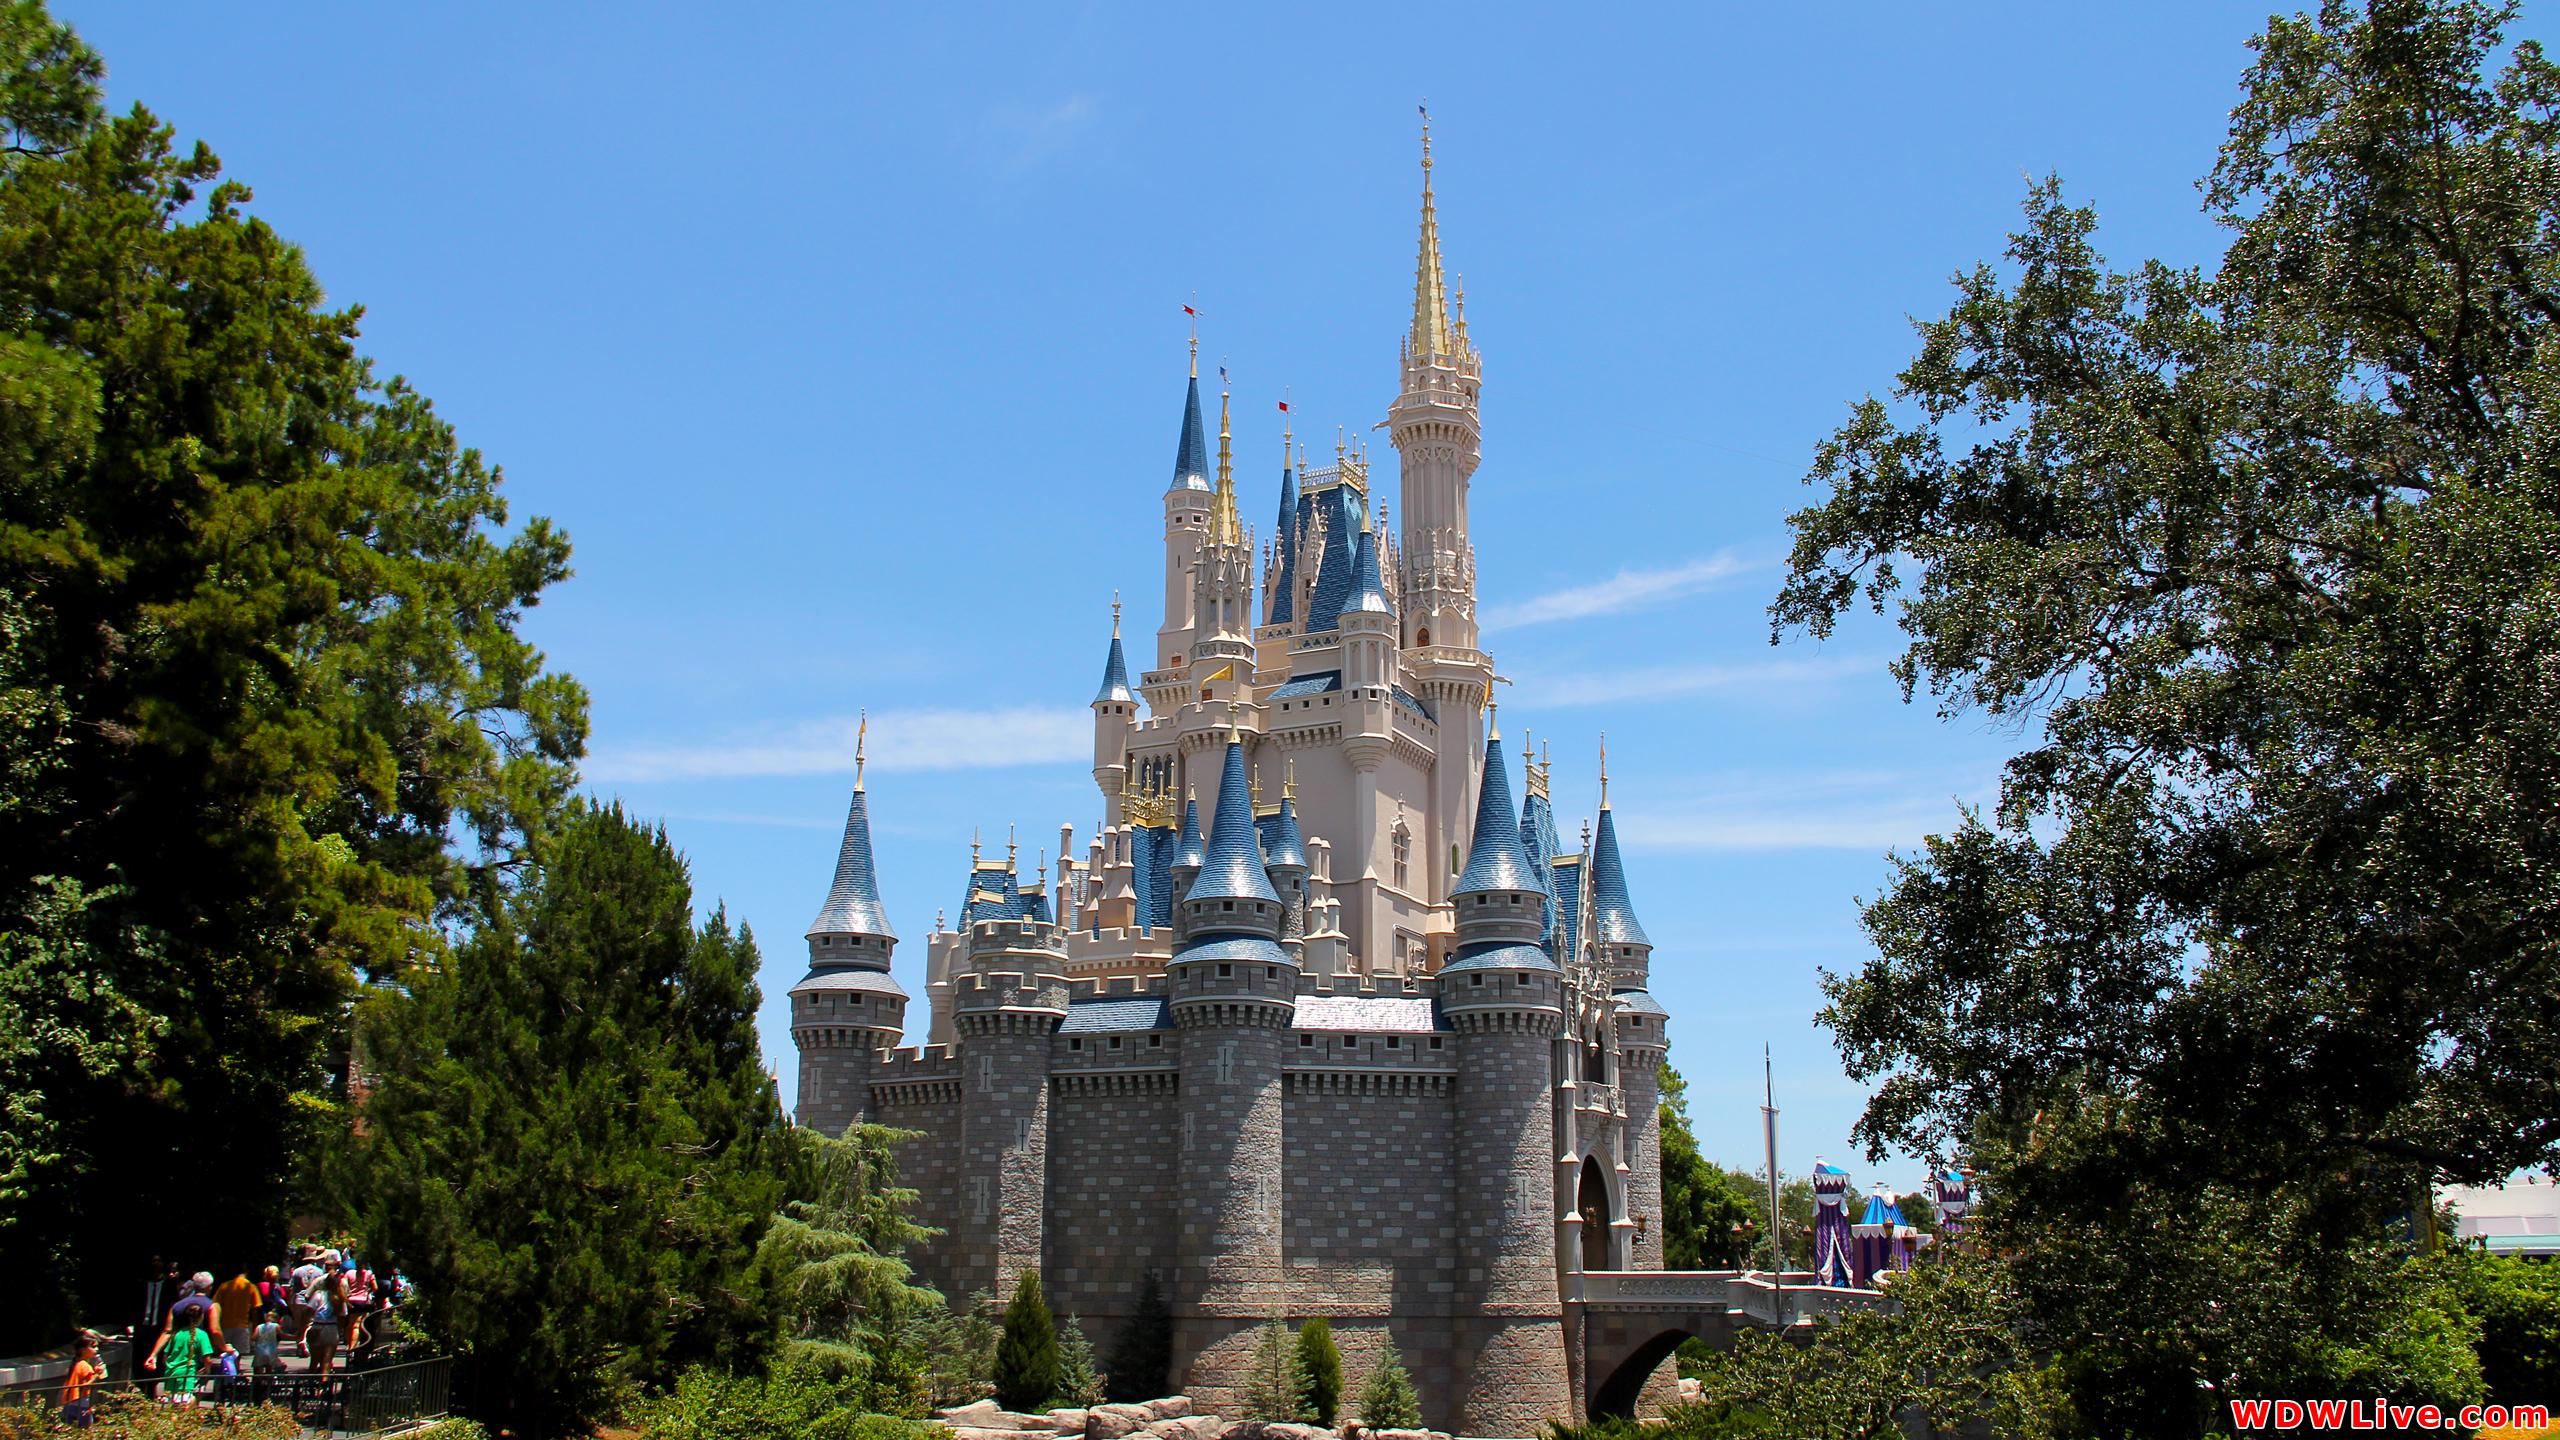 Magic Kingdom Castle Wallpaper Cinderella castle desktop 2560x1440